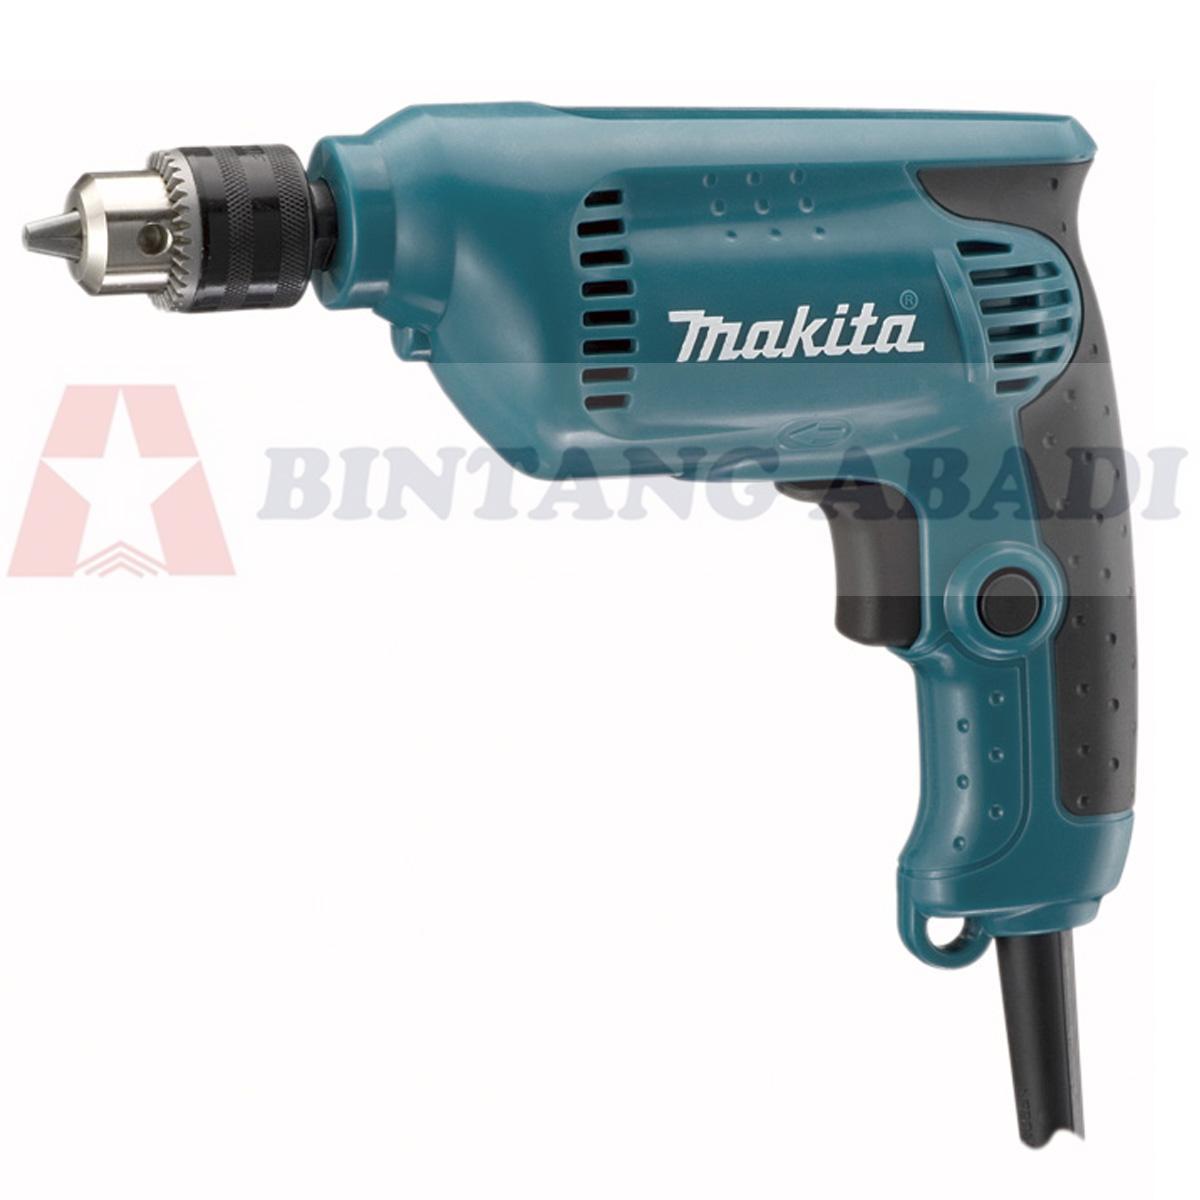 Termurah Makita Mesin Bor Listrik 10 mm 1 Arah / Non-Reversible Drill - 6411 Harga Grosir